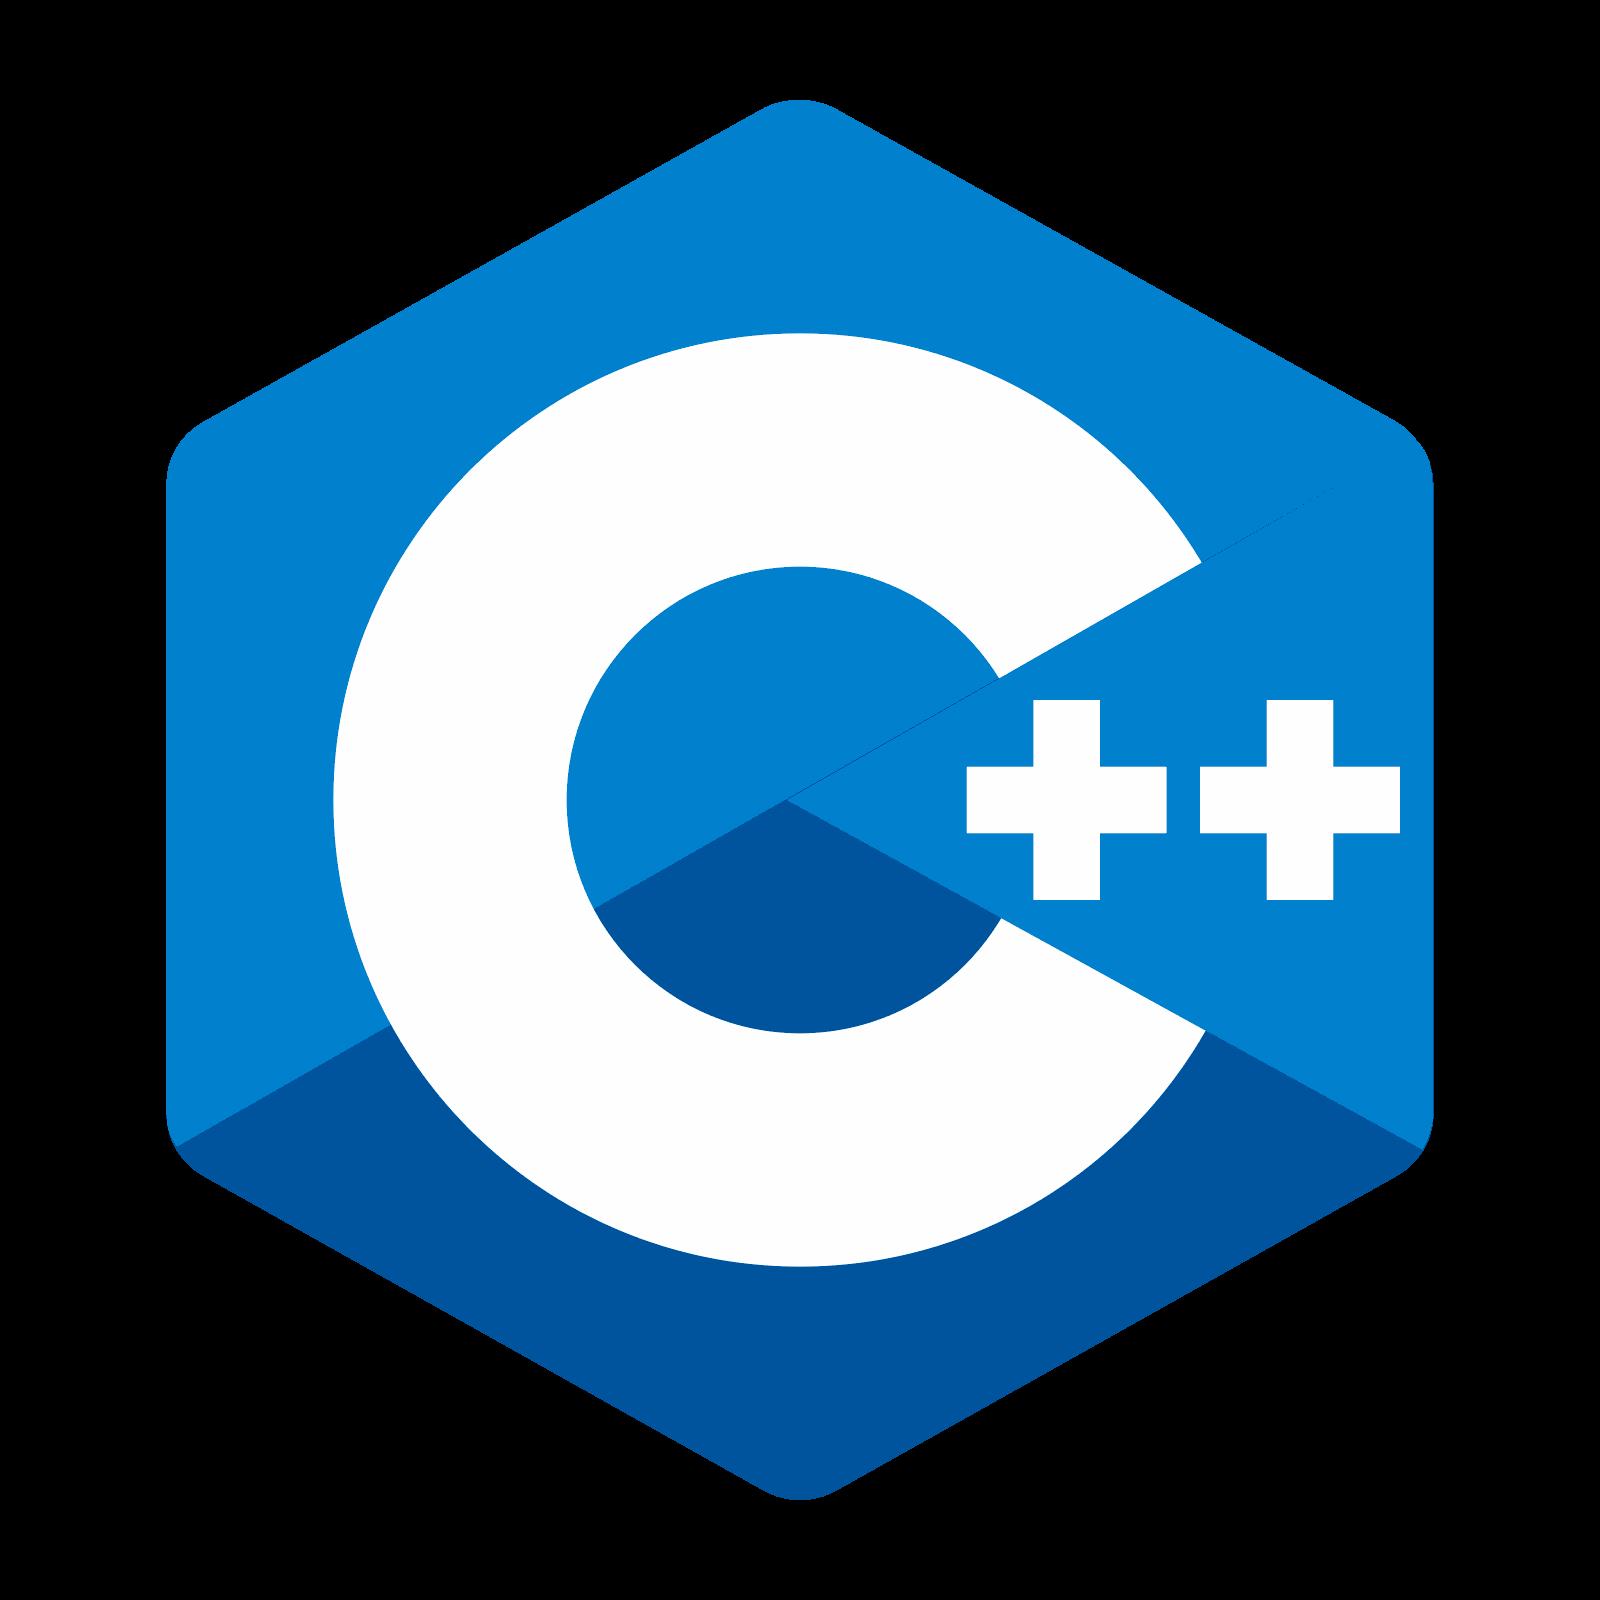 clip royalty free library programming vector c++ #115177862